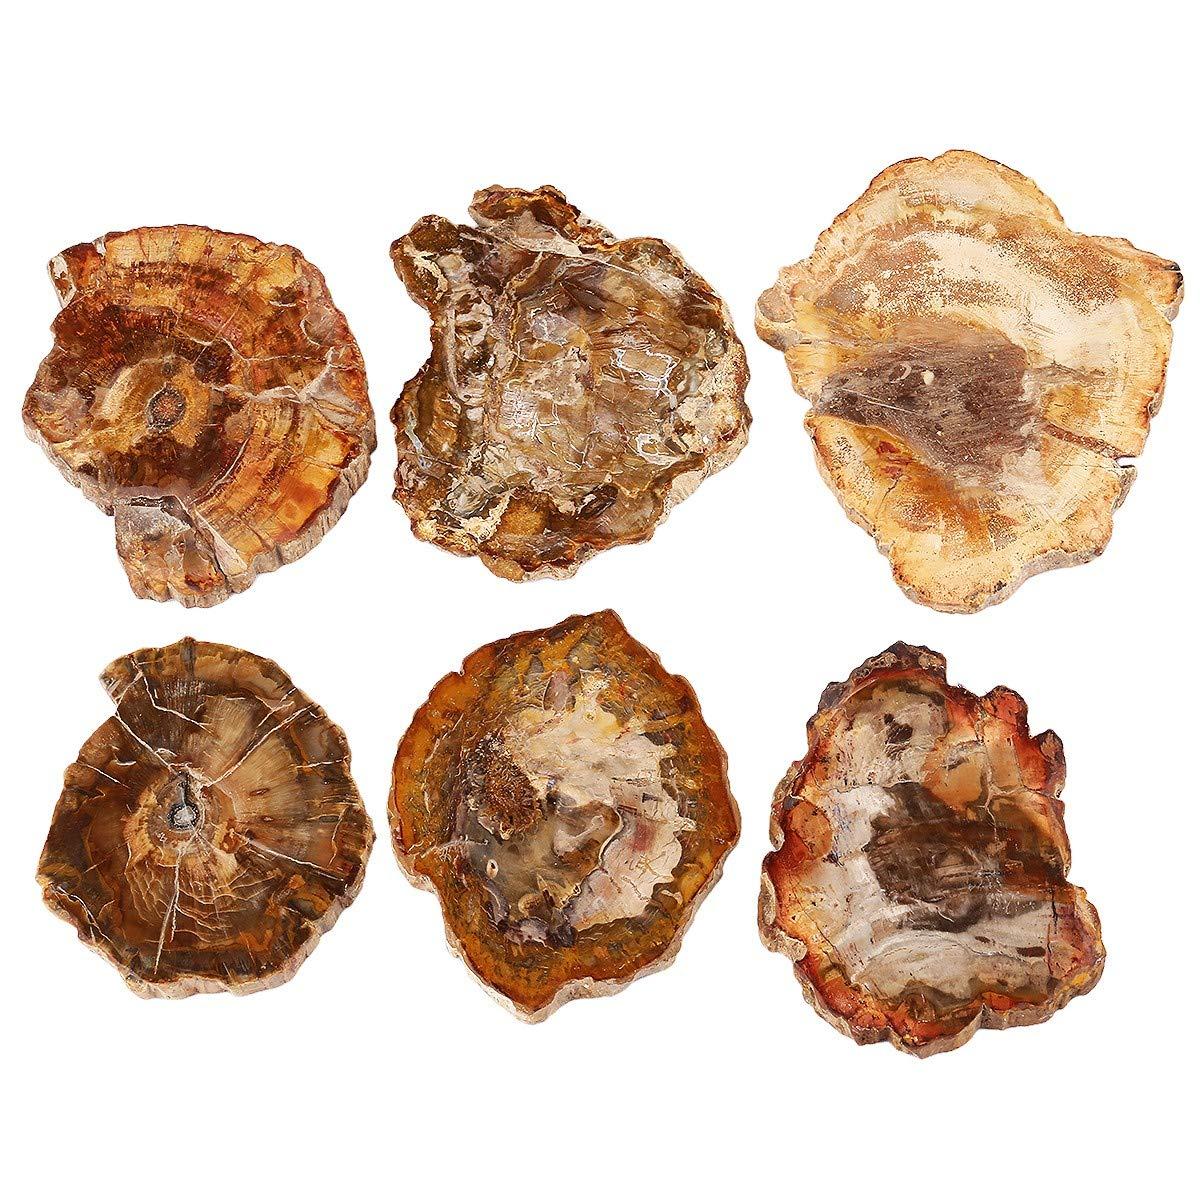 Pack of 1 SUNYIK Irregular Natural Petrified Wood Slab Slice Stone Mineral Specimen 3-5